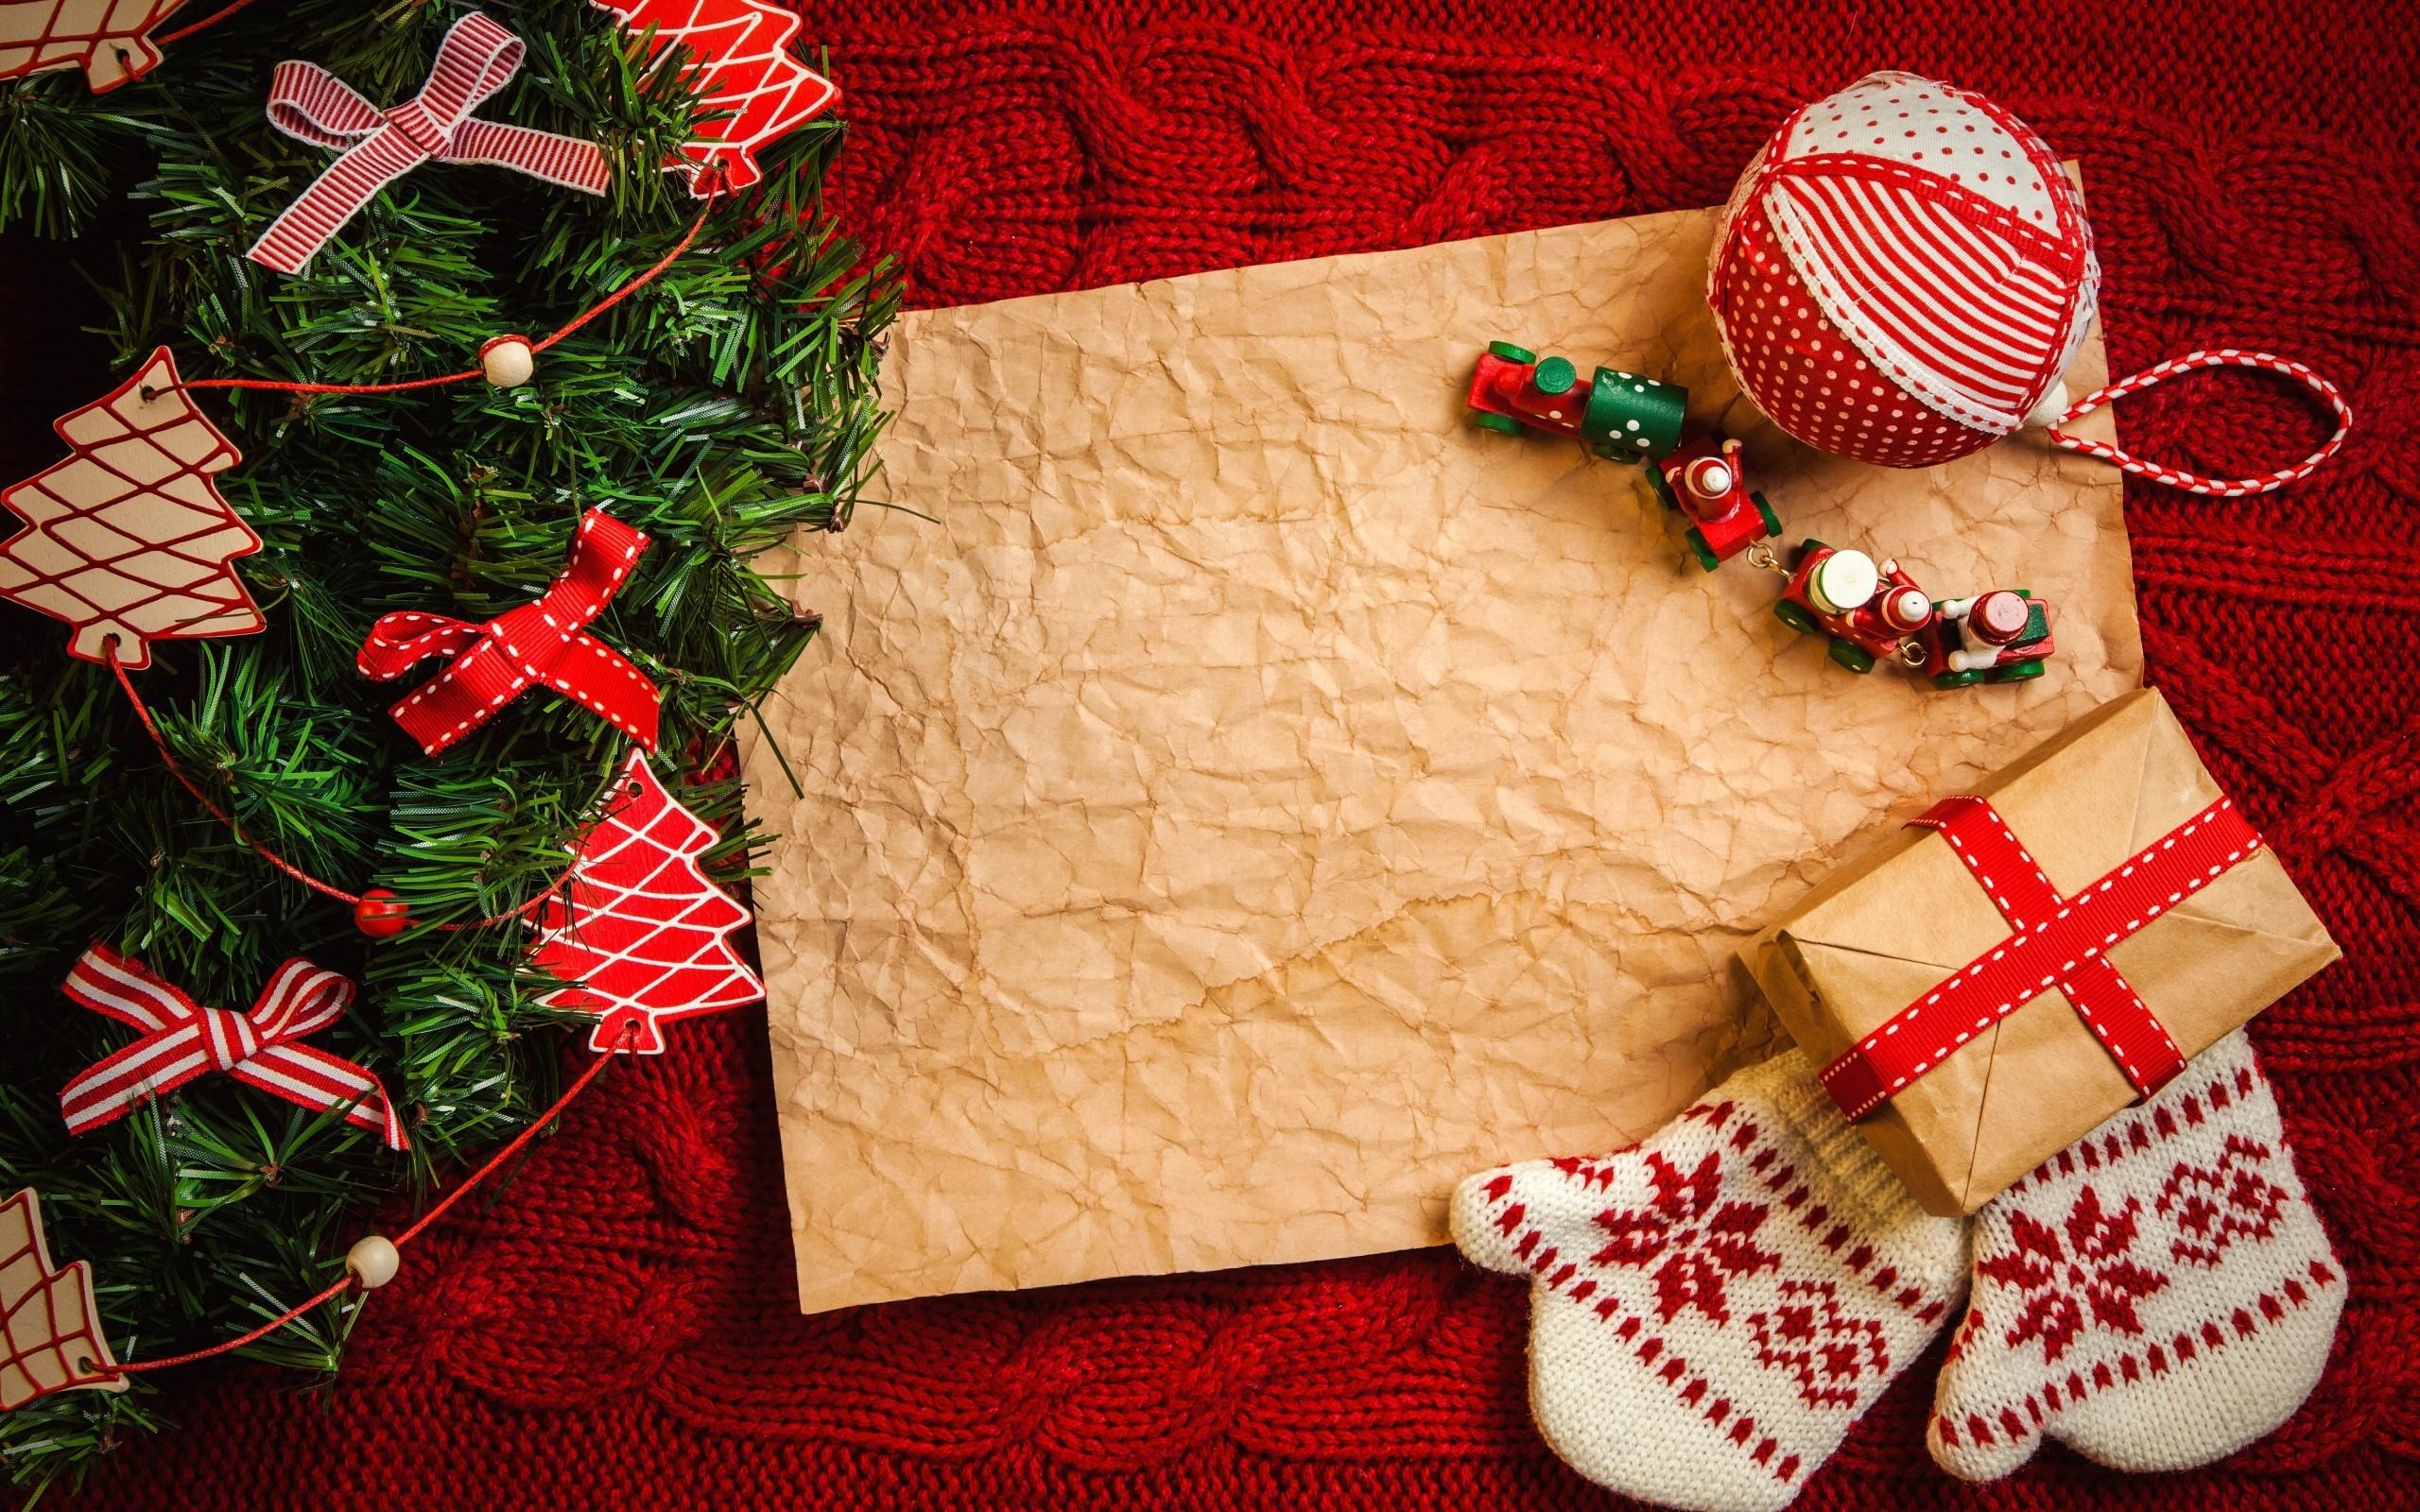 Merry Christmas Wallpapers Hd Desktop Wallpapers 4k Hd